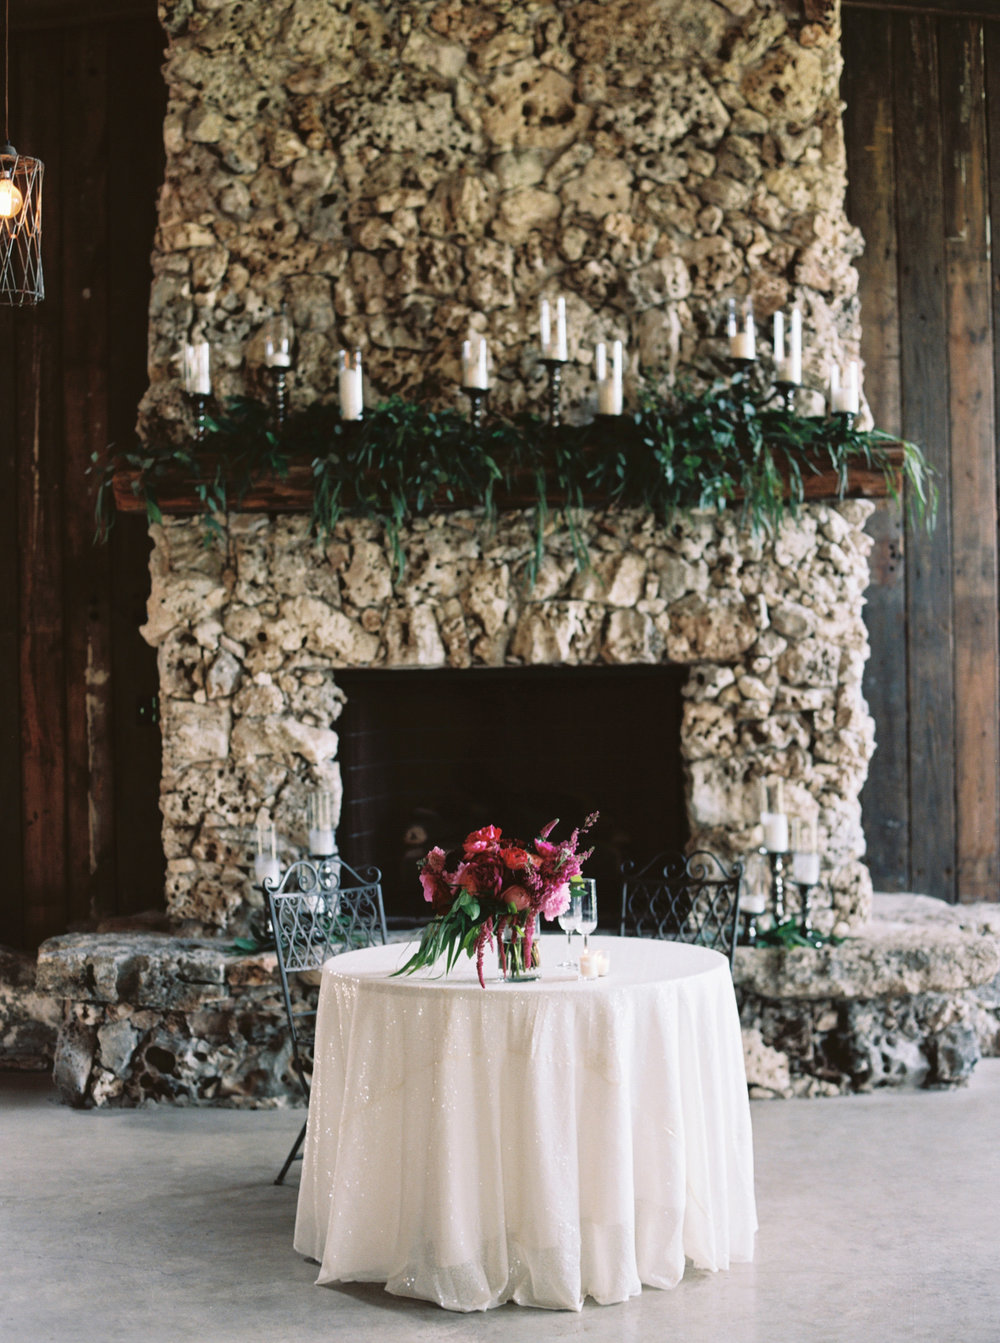 The-Creek-Haus-Wedding-Dripping-Springs-17.jpg